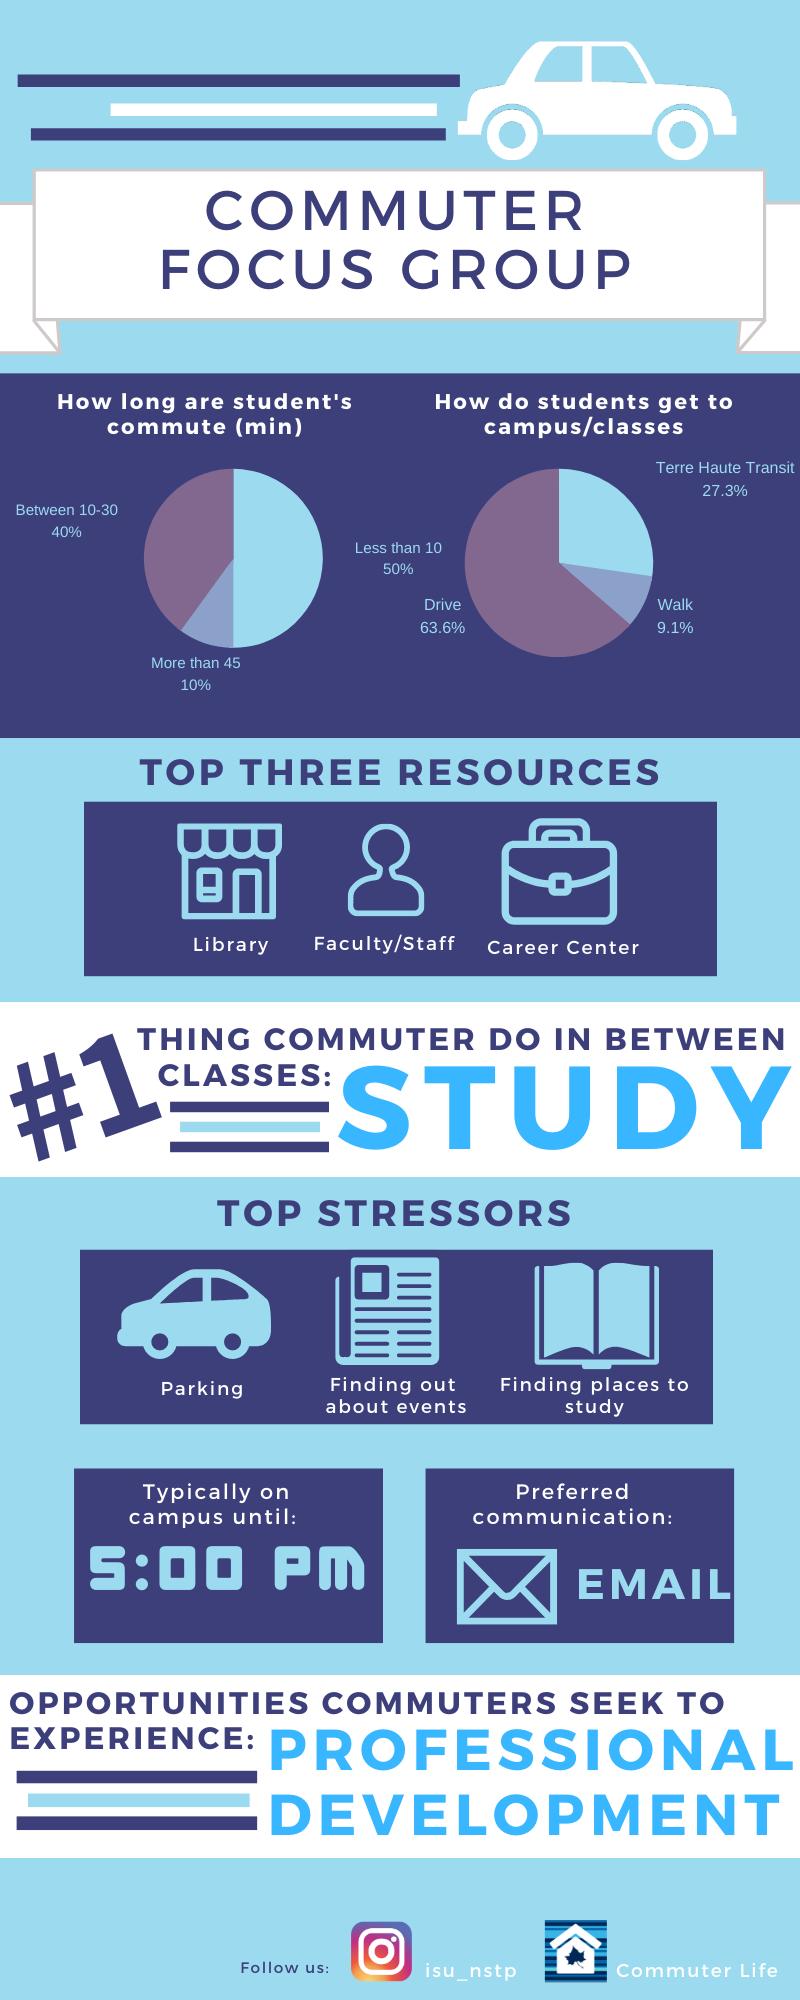 Commuter Life Focus Group